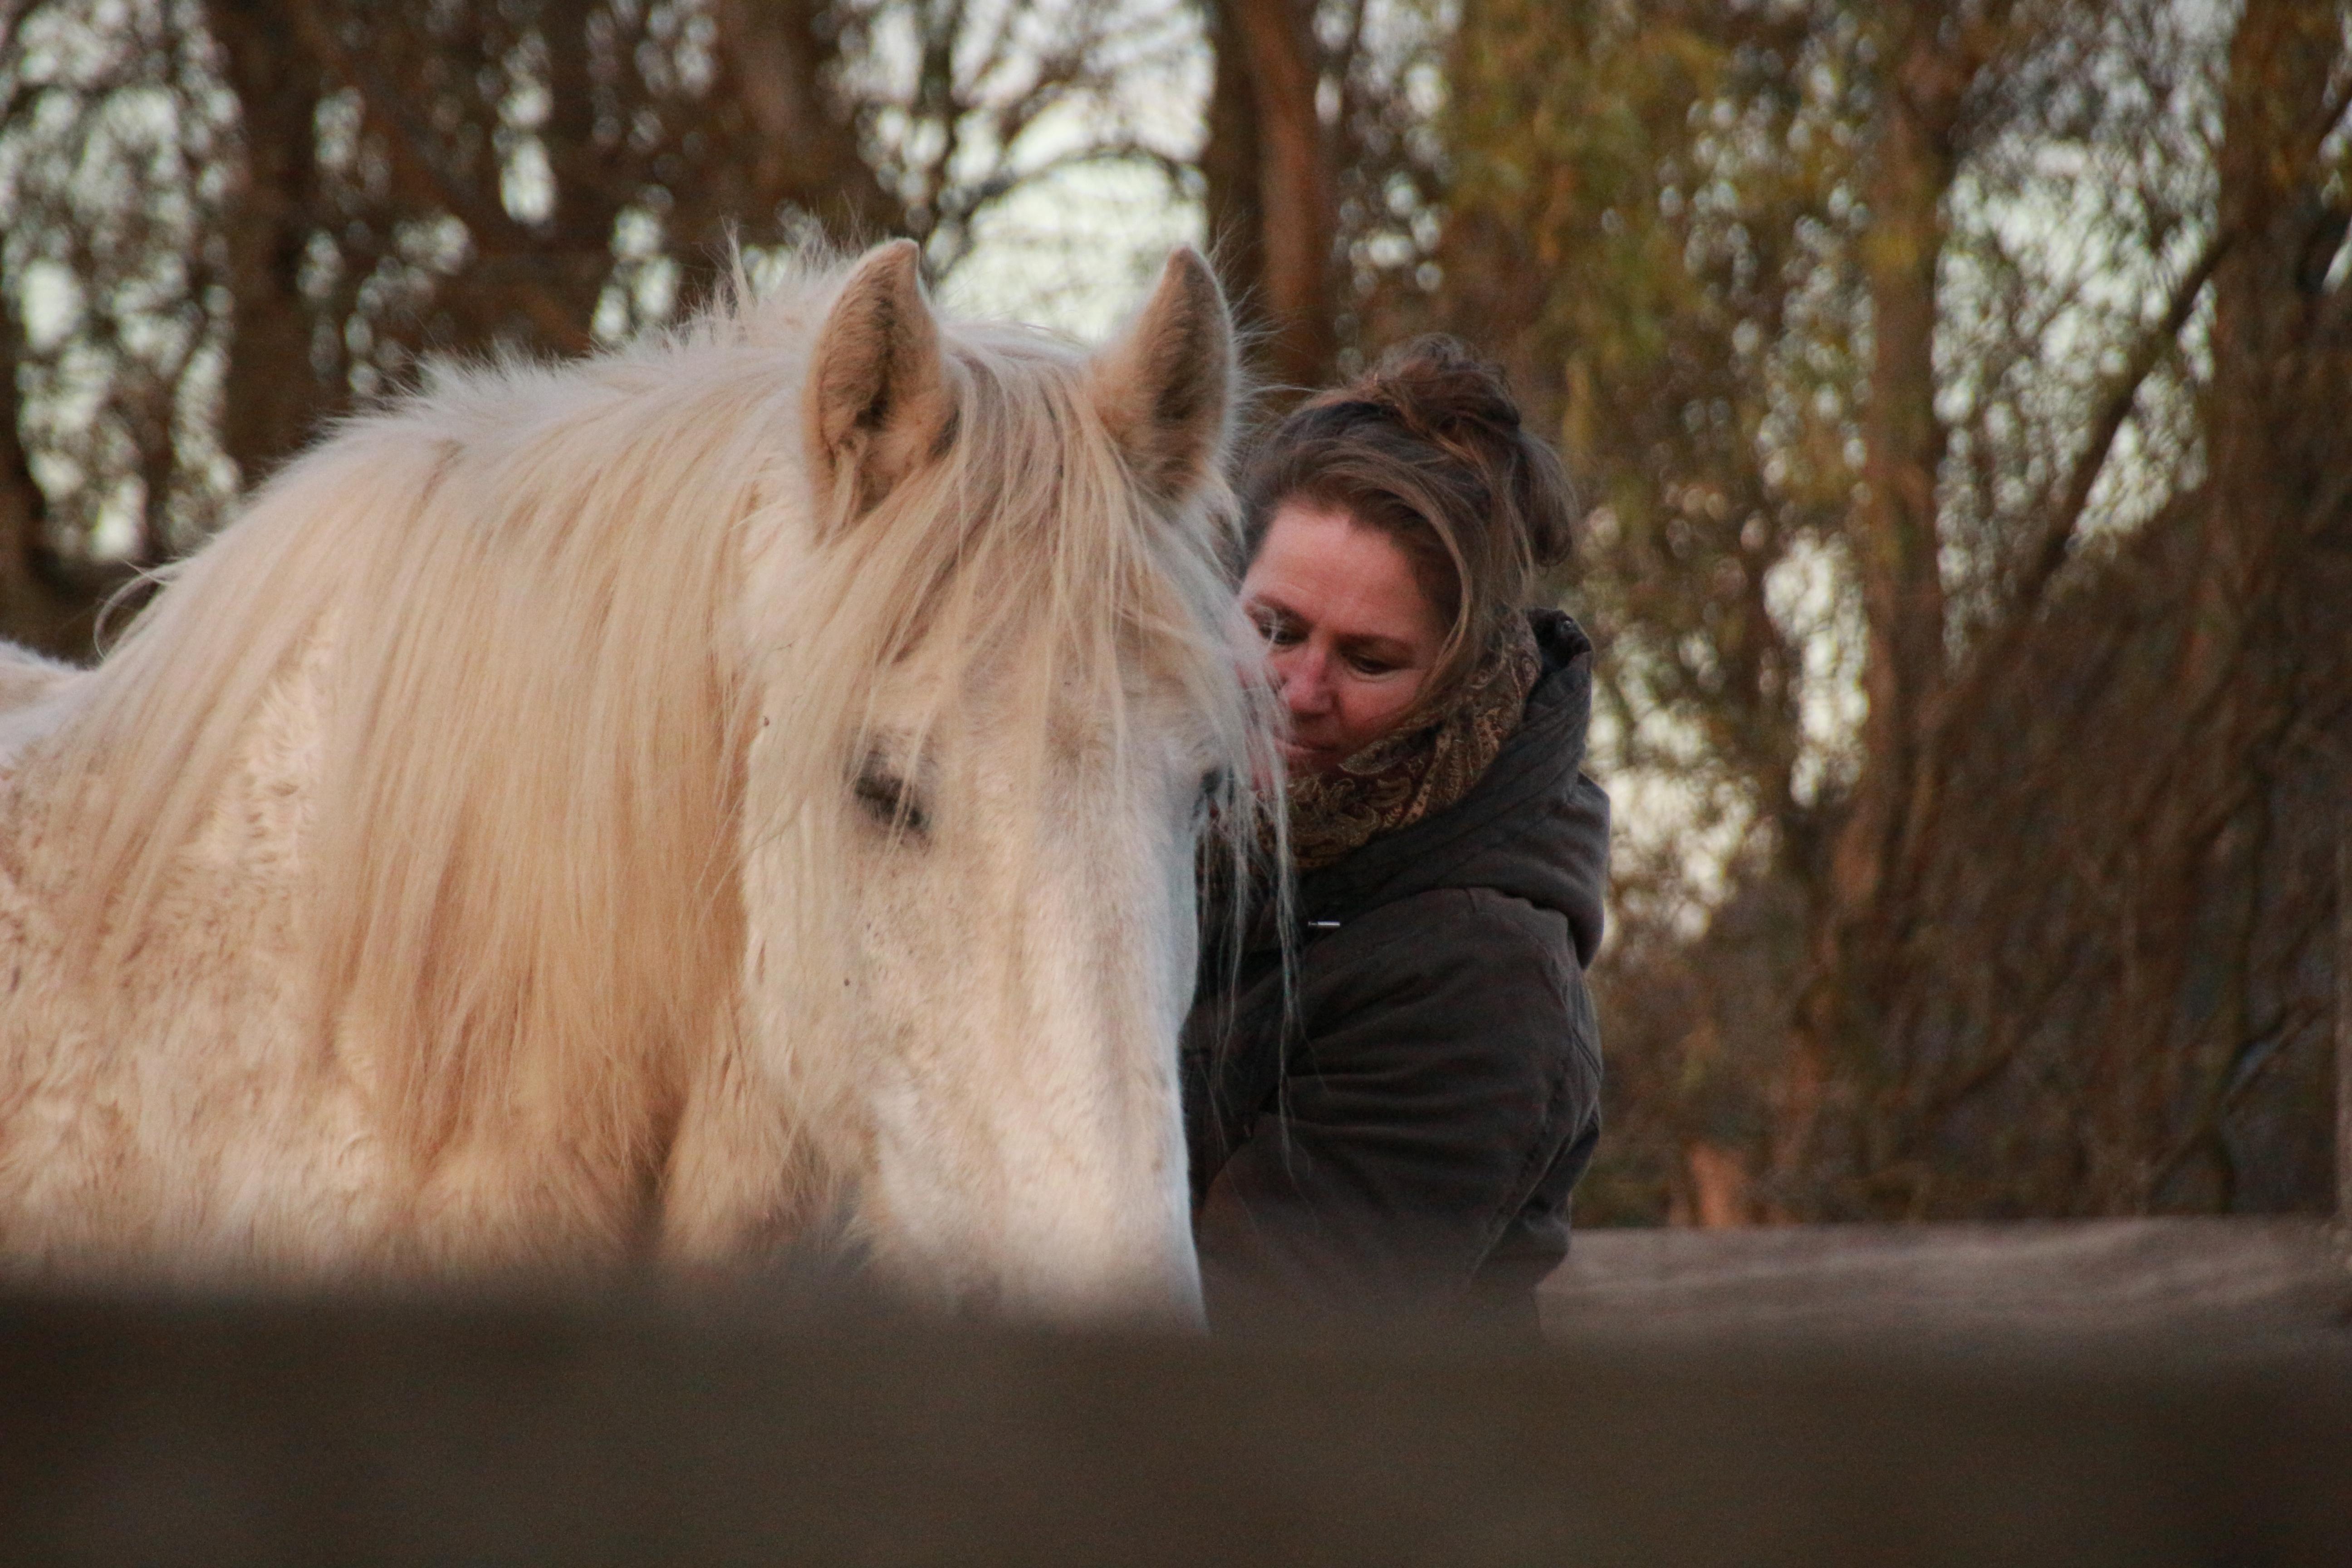 Paardencoaching - Utrecht - Gelderland